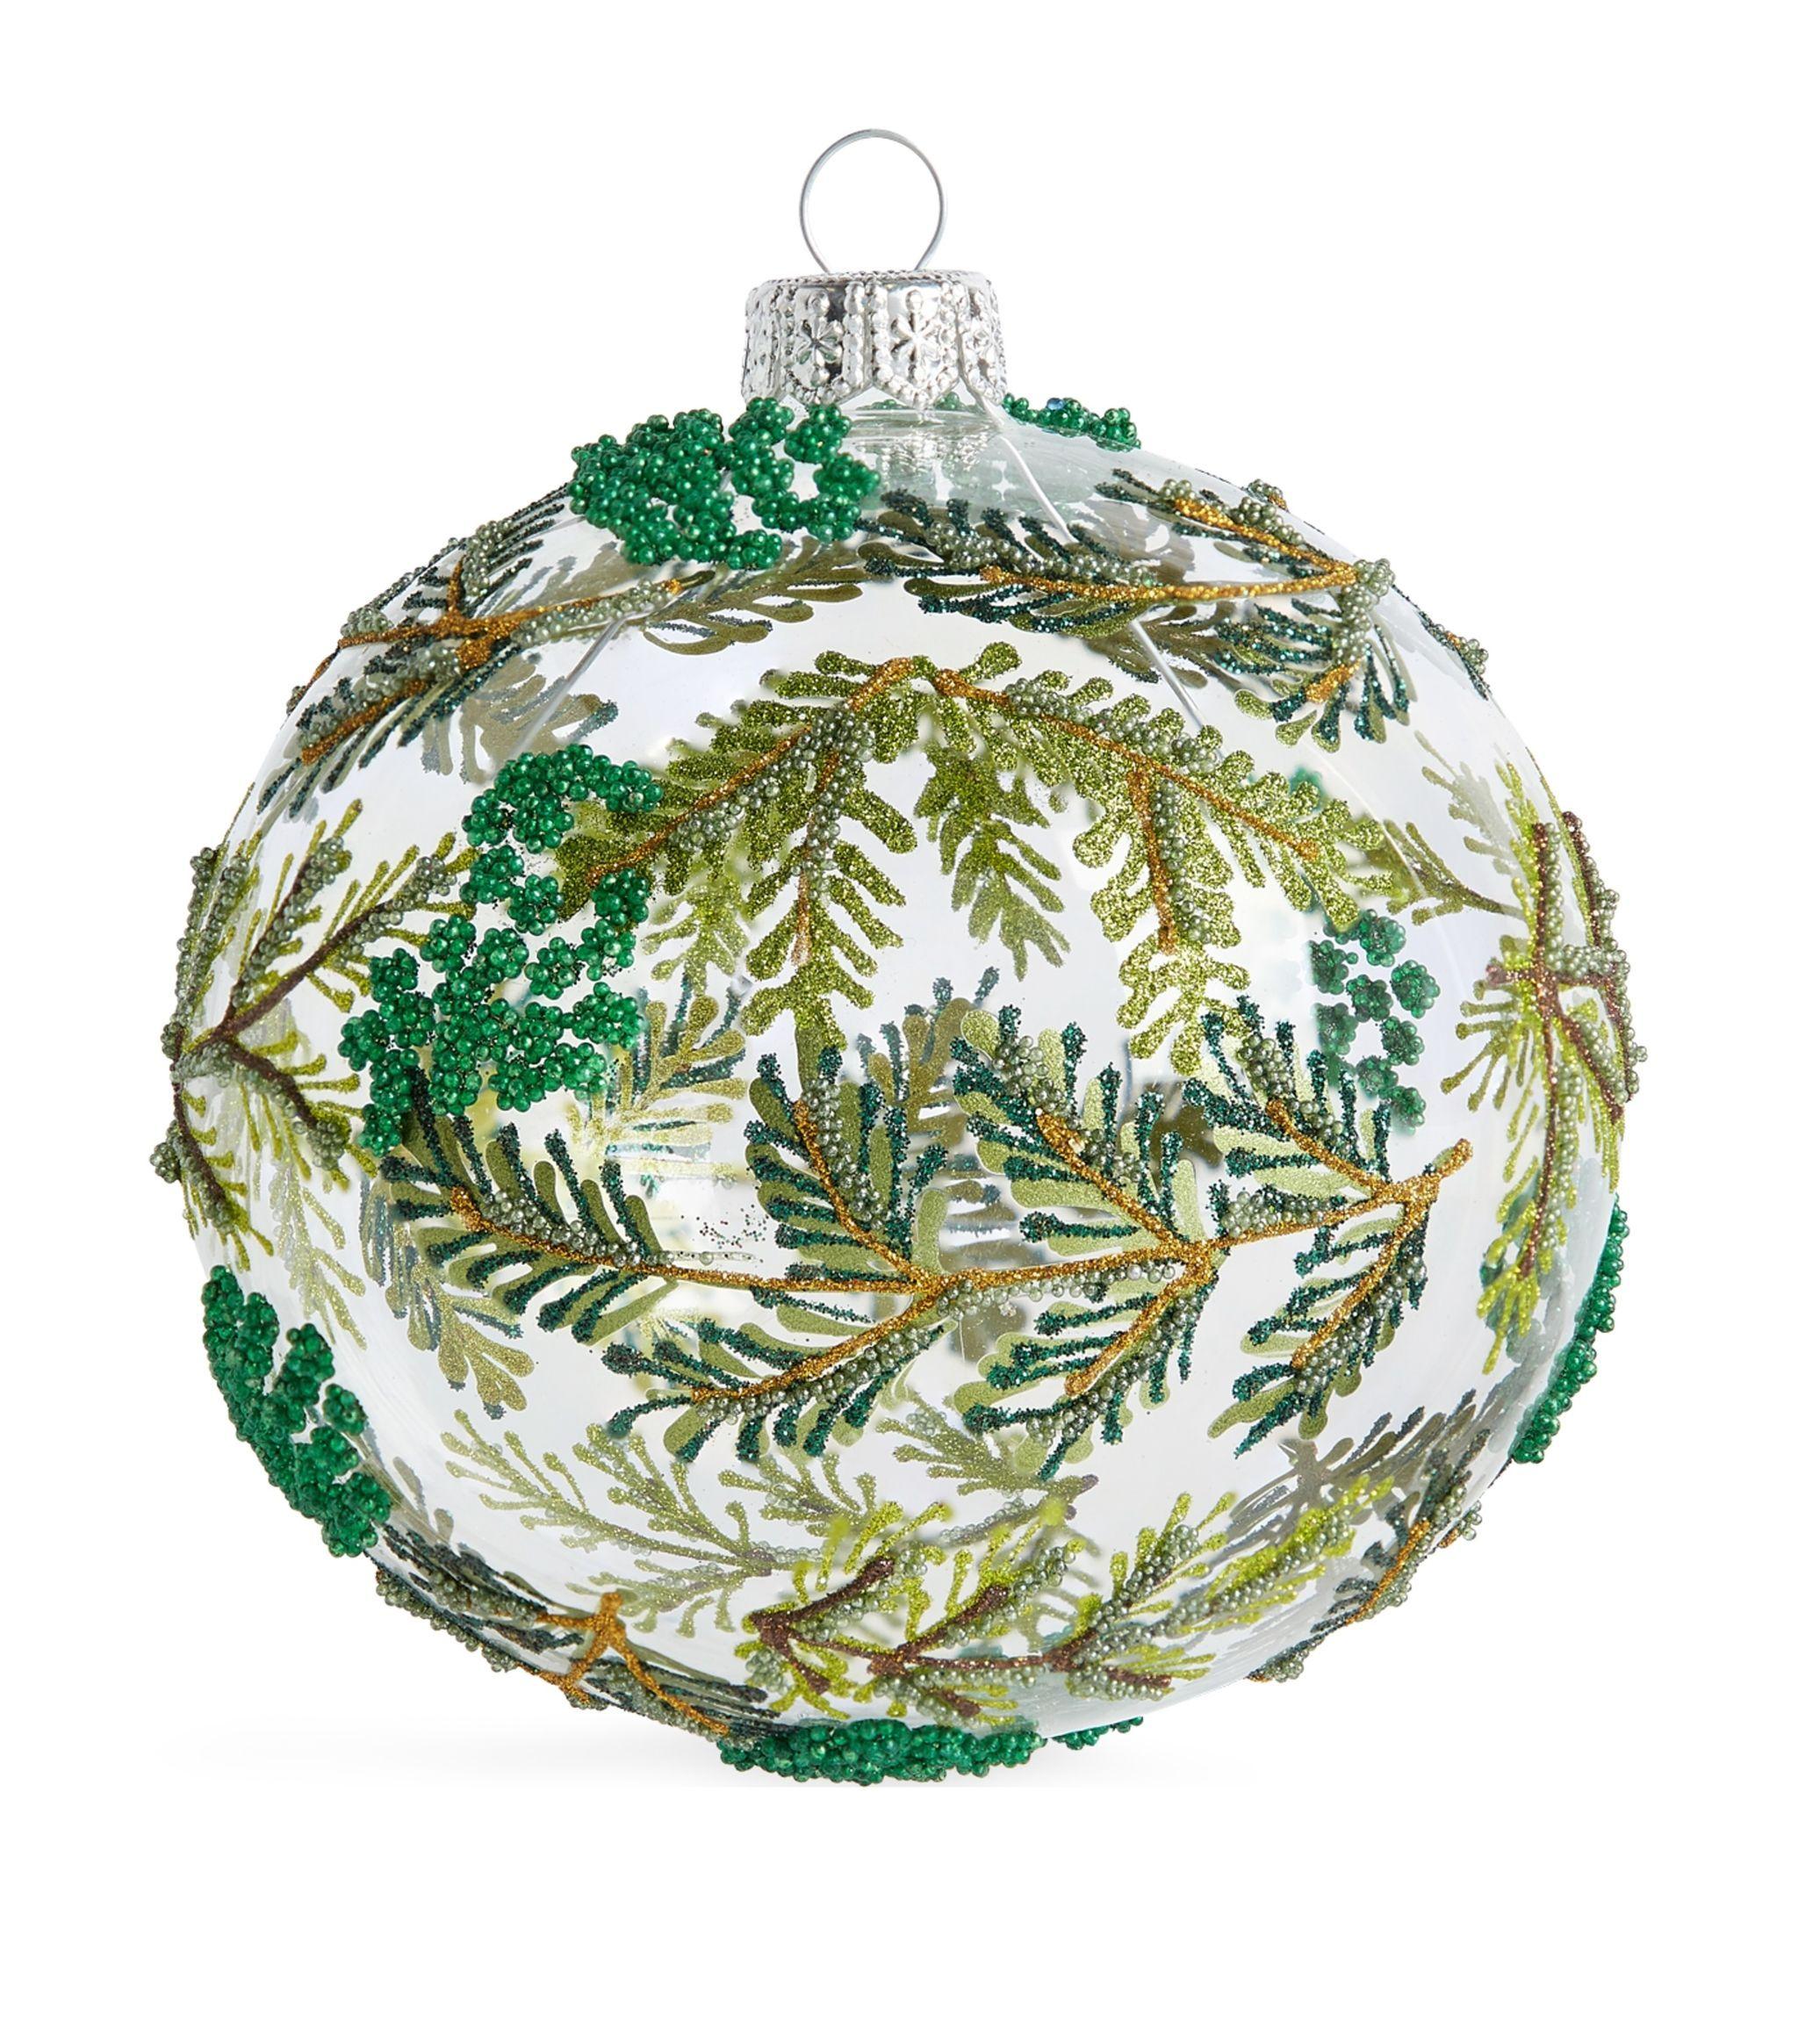 Harrods Beaded Leaves Bauble Harrods Us In 2020 Beaded Leaf Harrods Christmas Christmas Tree Ornaments